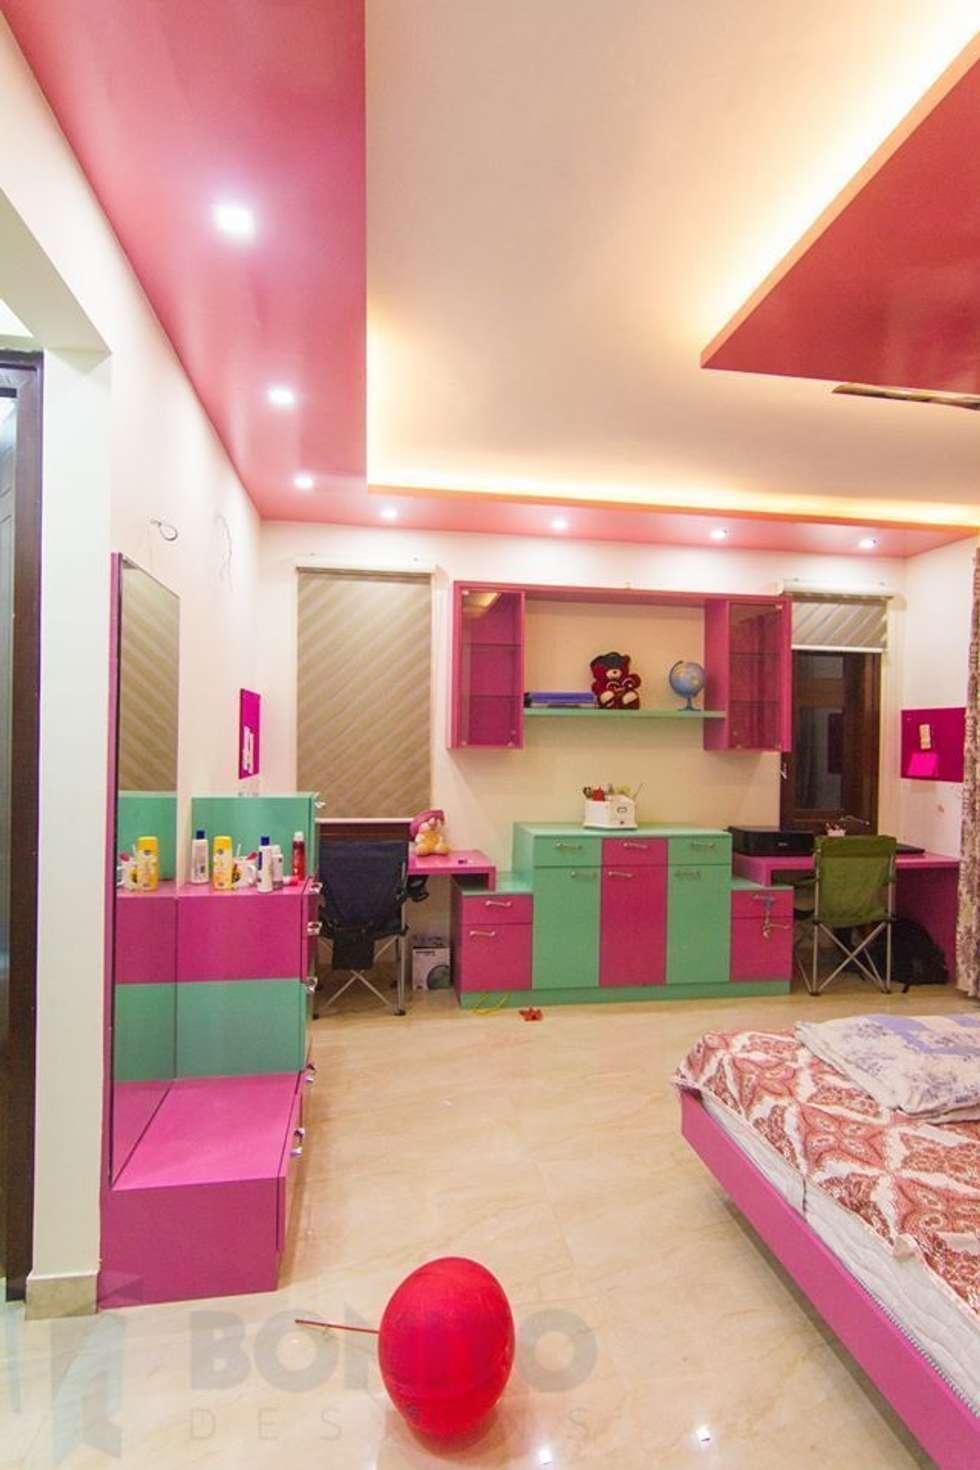 industrial bedroom photos: kids bedroom study table | homify